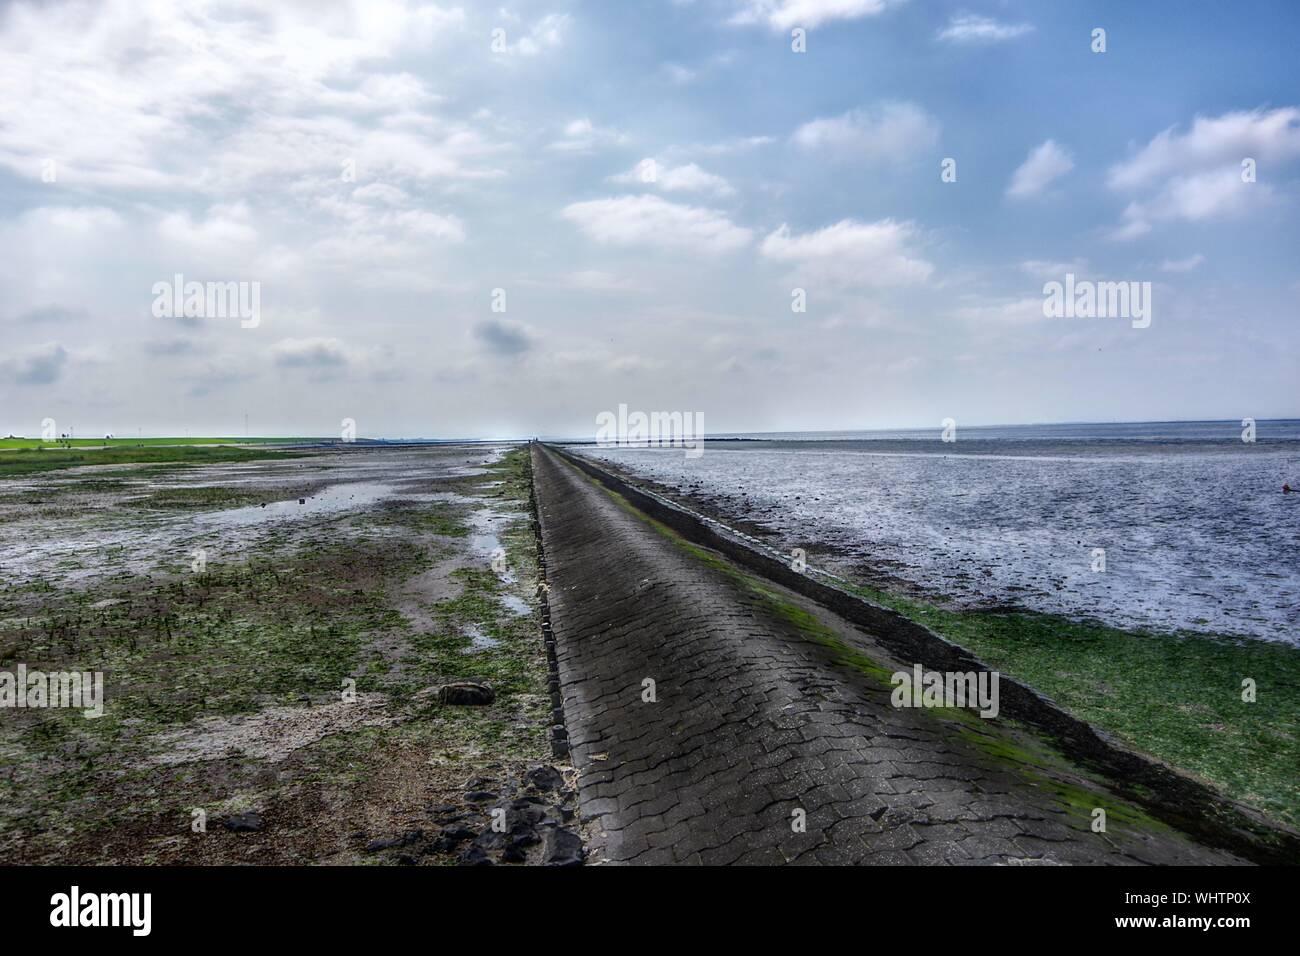 Vista panorámica del mar contra el cielo Foto de stock